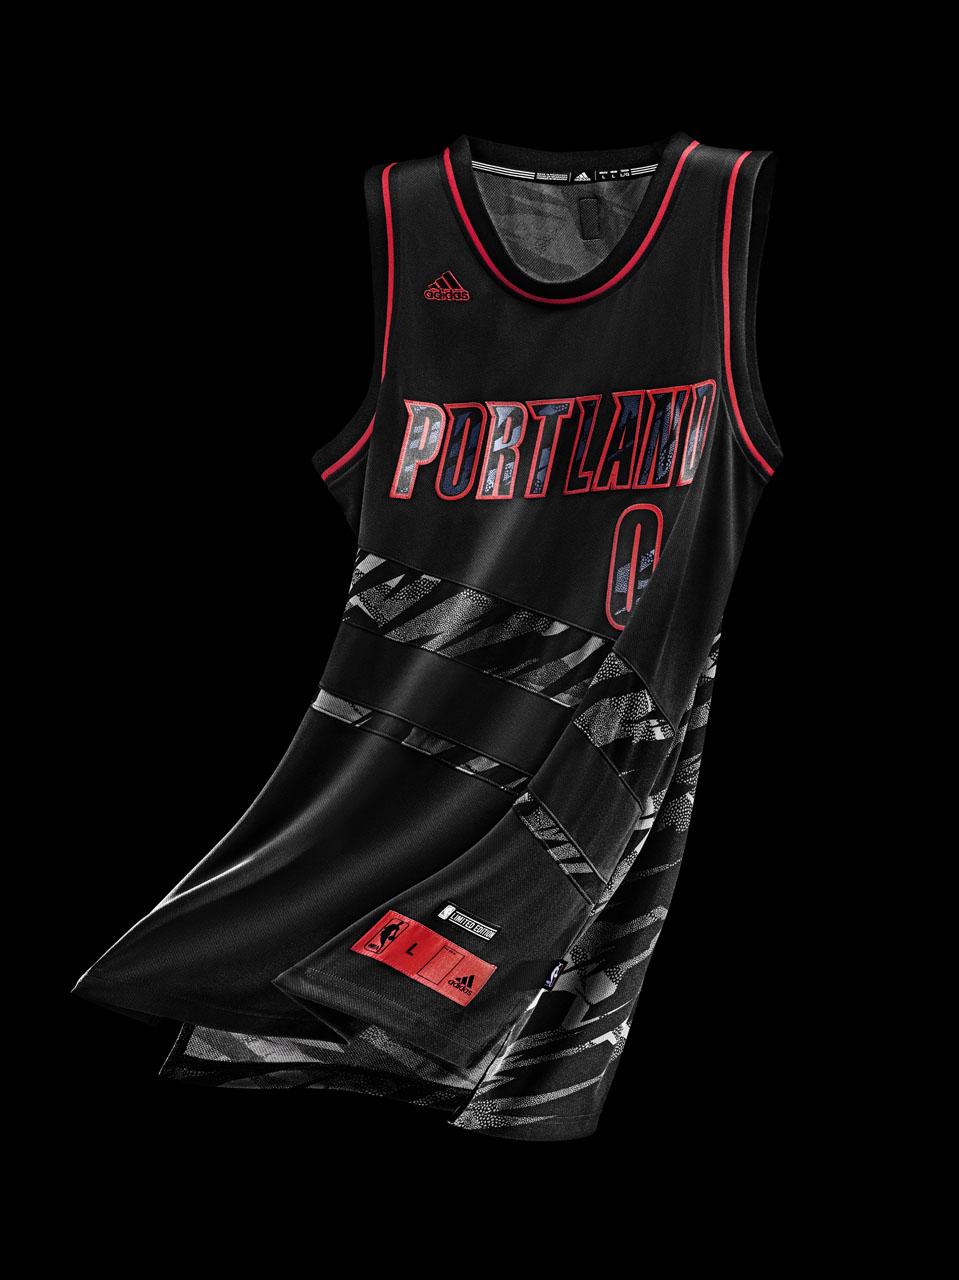 Adidas_NBA2K14_Nonbox_7857_W1.jpg